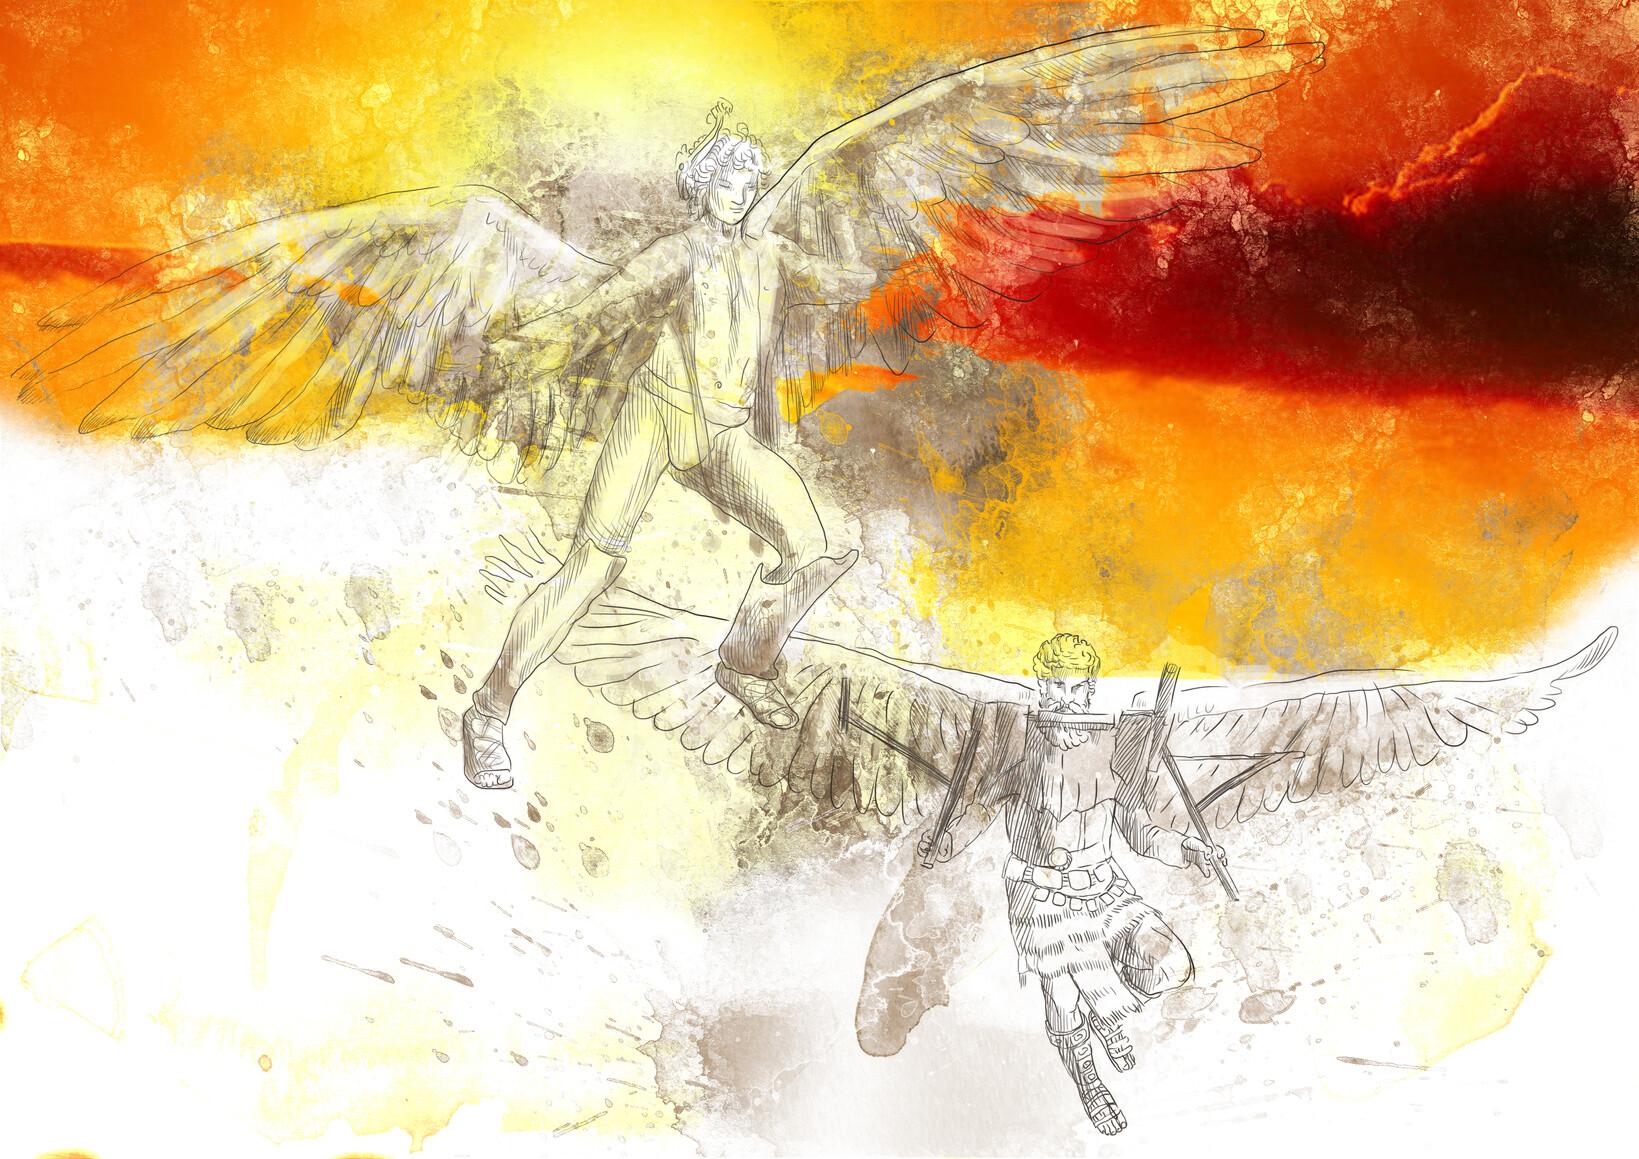 """Daedalus-Dilemma"" des Immunsystems nimmt Anleihe bei Daedalus und Icarus aus der griechischen Mythologie. © kuco_Fotolia.com"